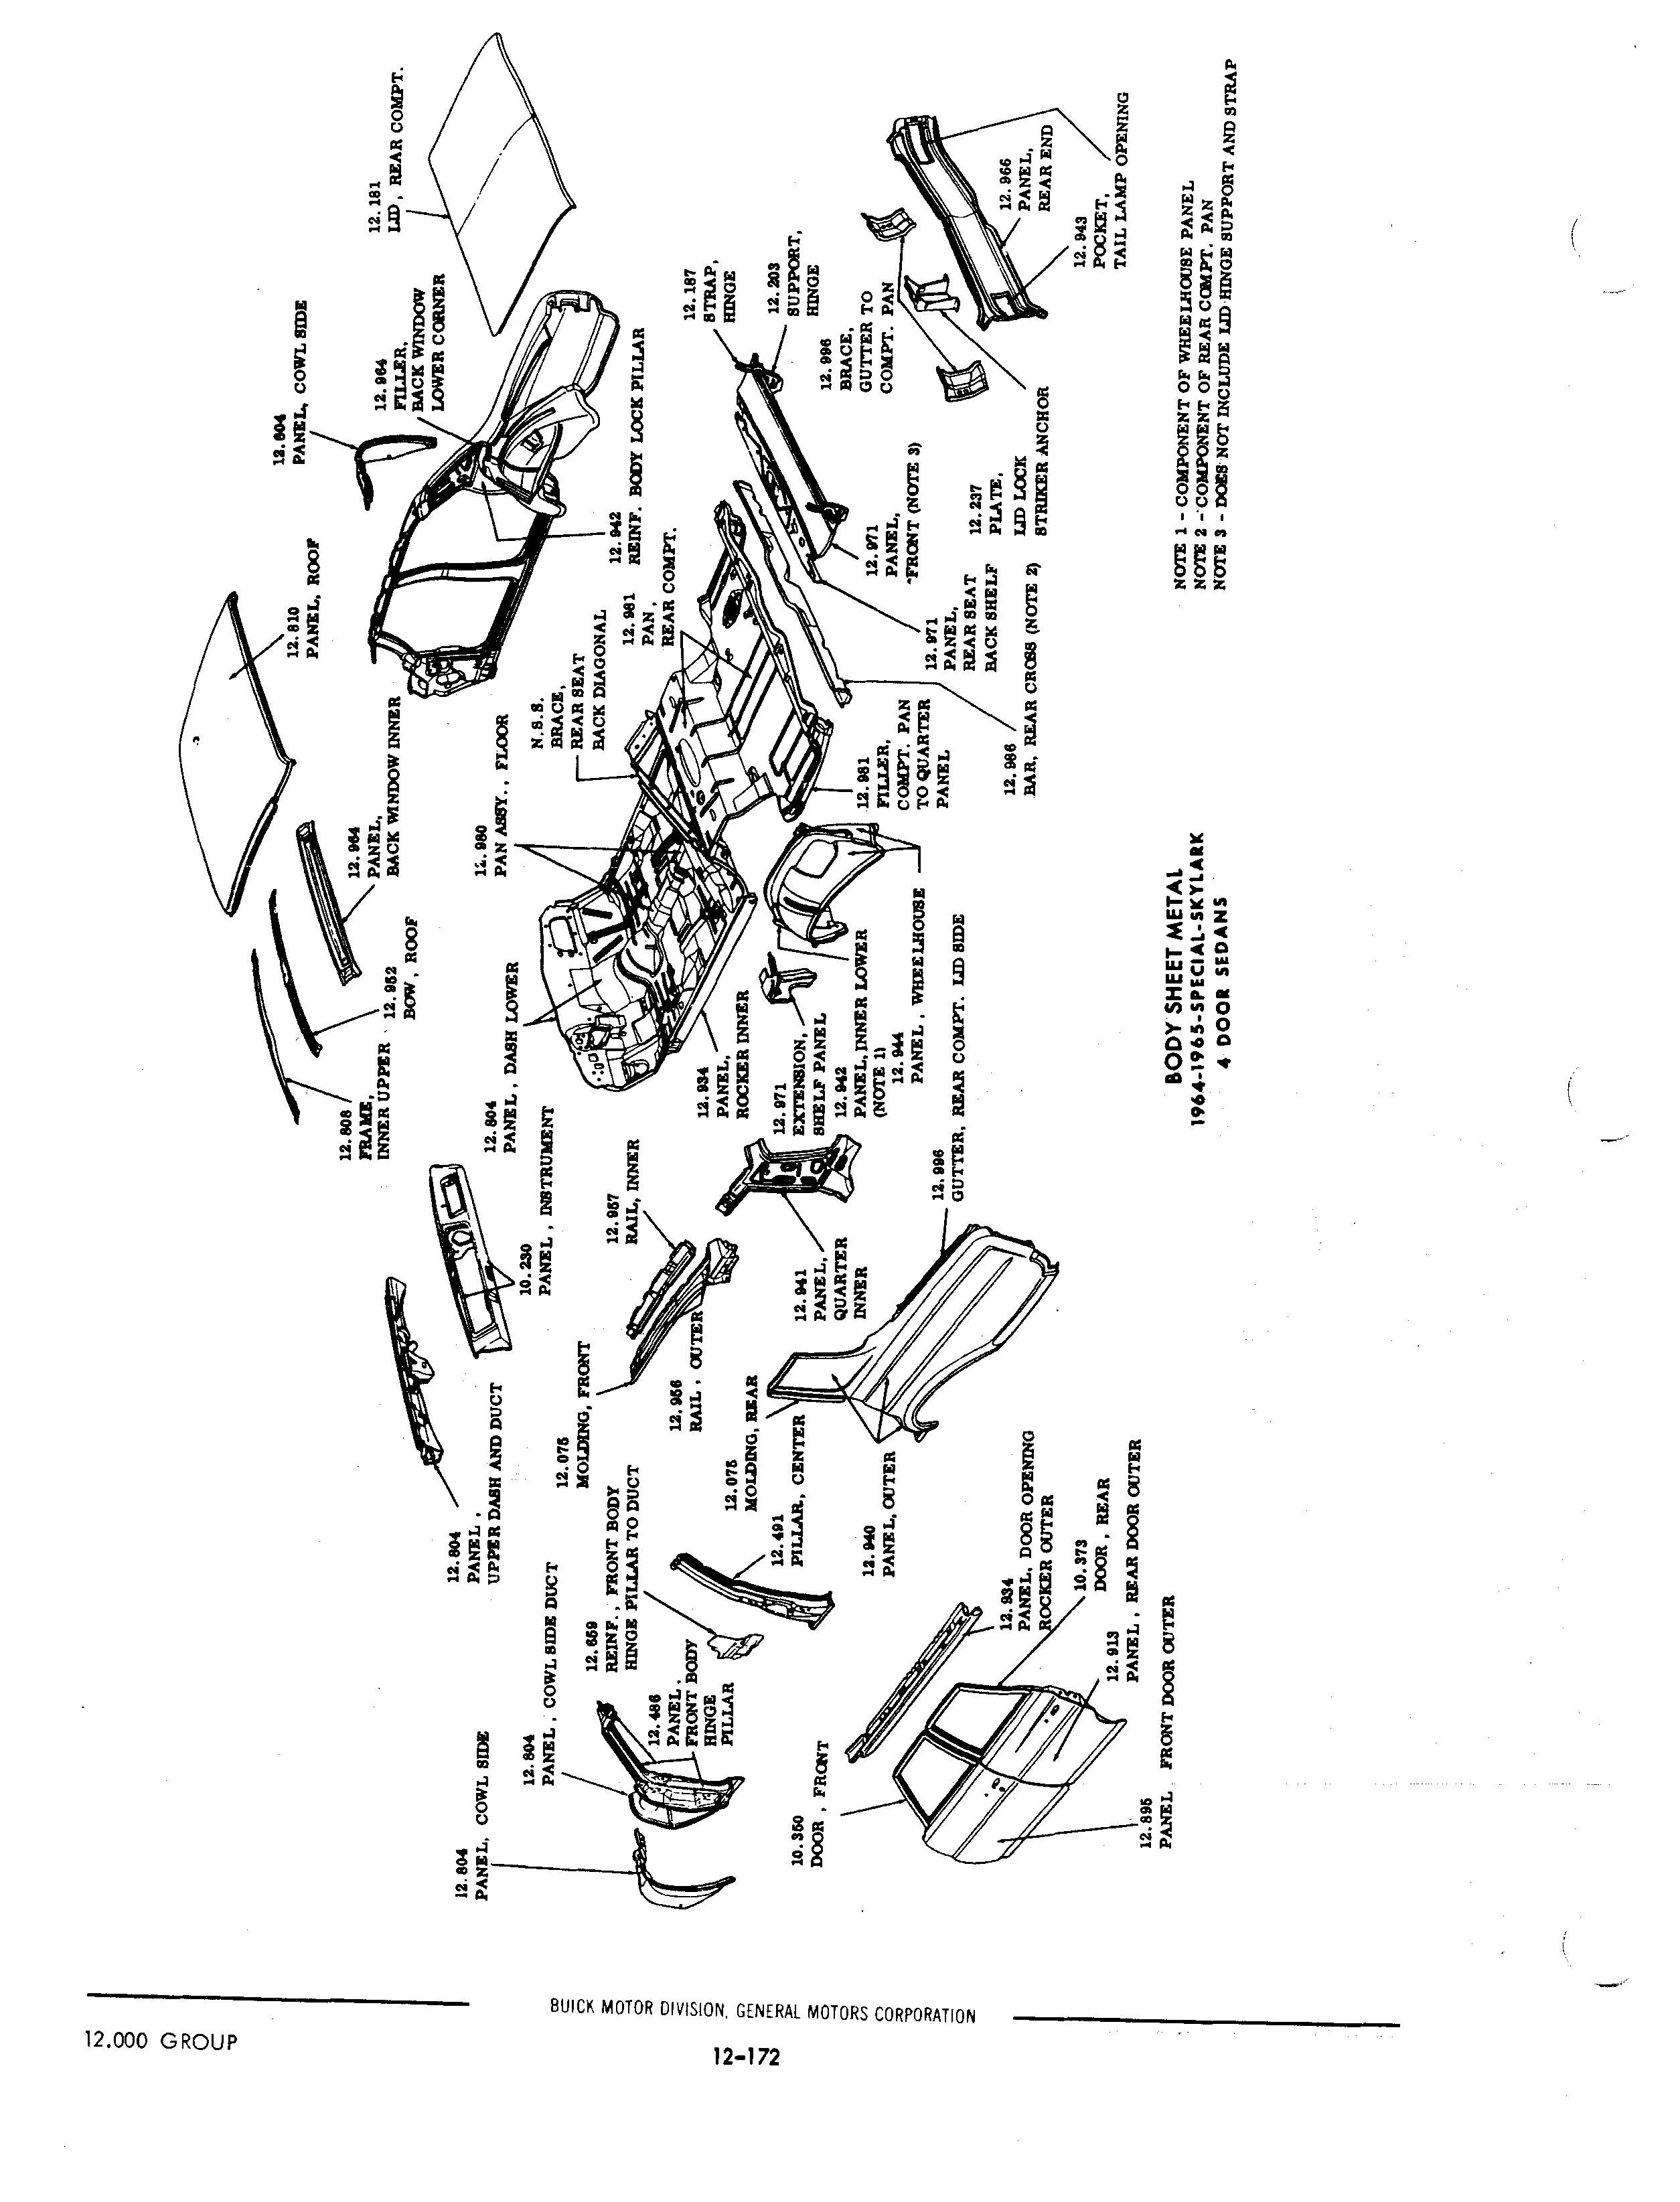 Old Fuse Box 1940 Manual E Books 1972 Buick Wiring Diagram Schematic Schematics Diagramold Auto Electrical Gravity